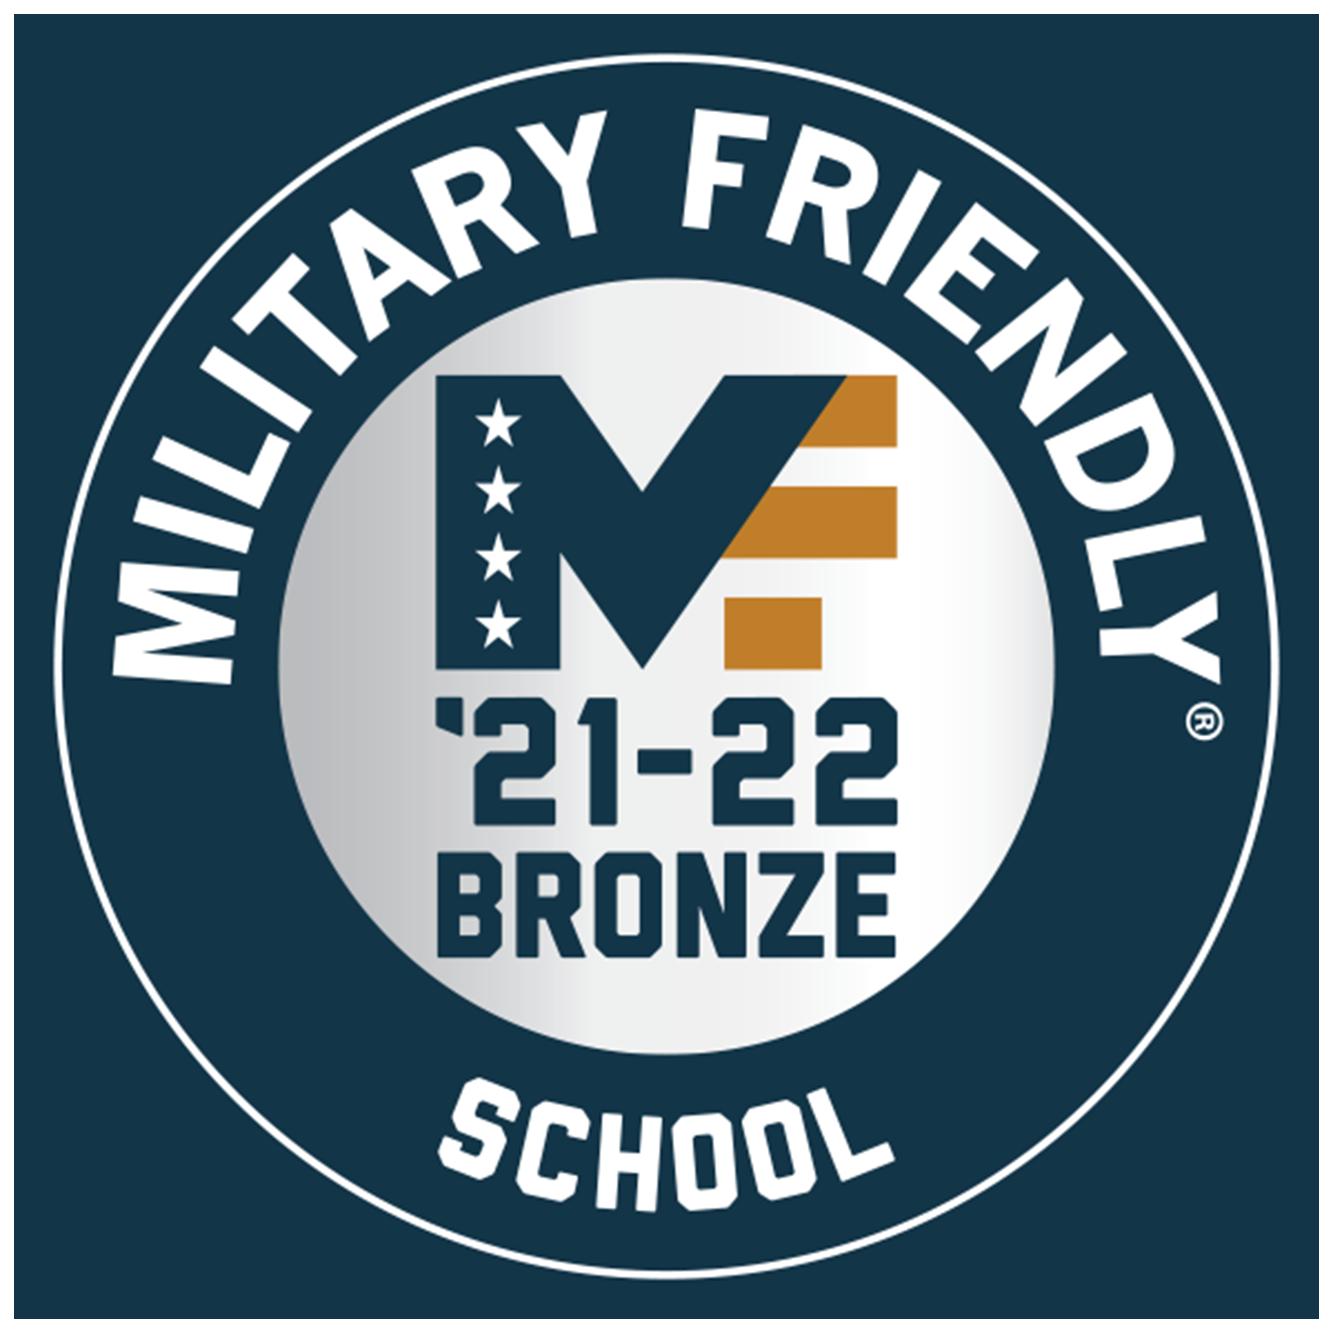 Military Friendly School Bronze logo.